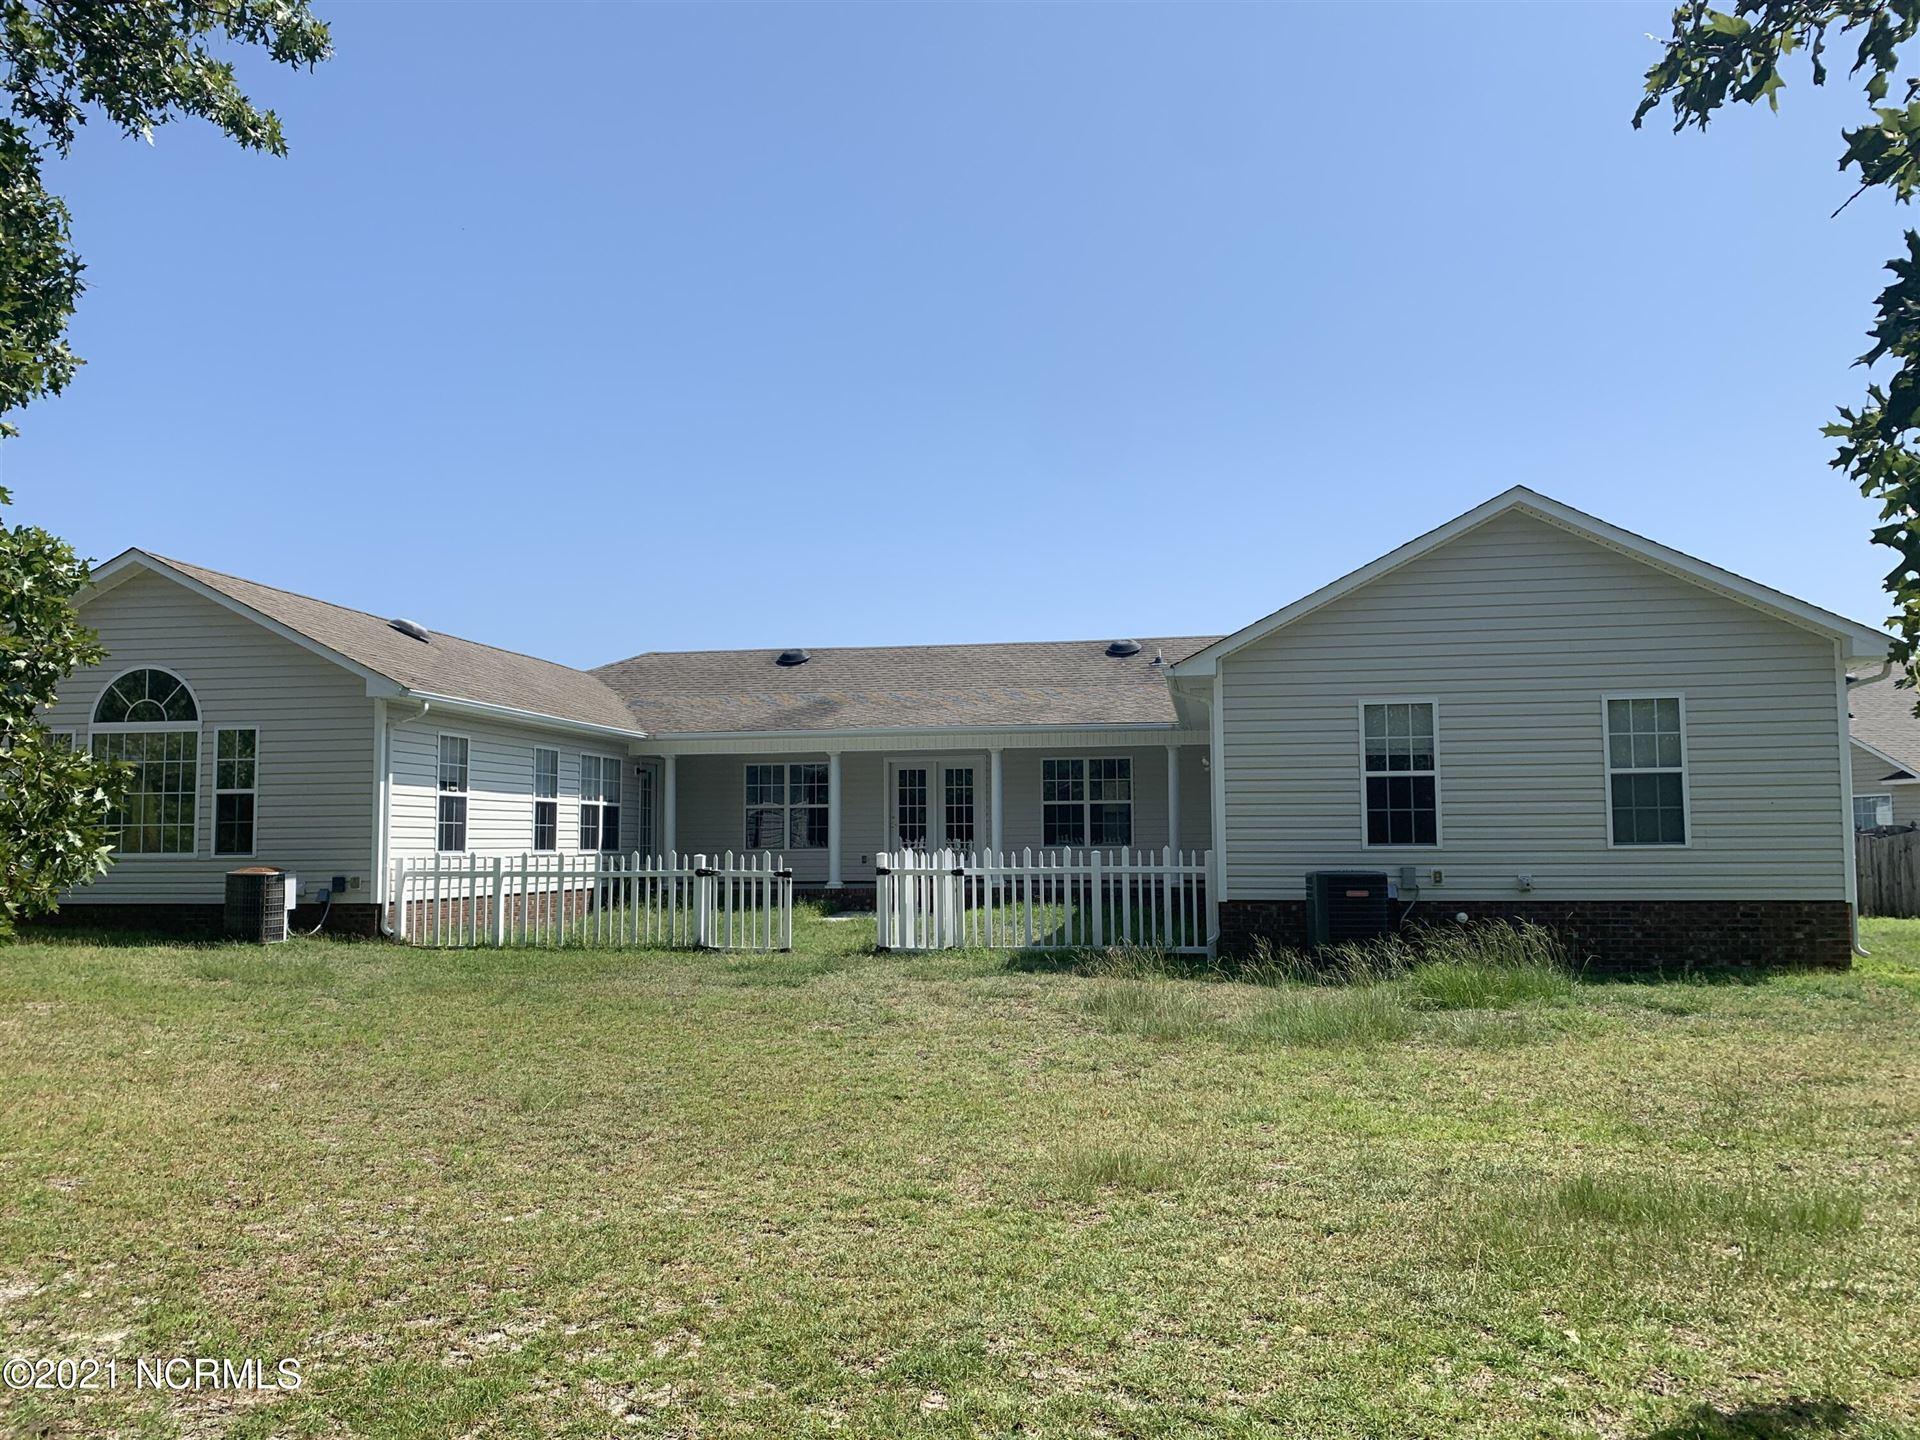 Photo of 527 Quailwood Court, Cape Carteret, NC 28584 (MLS # 100288563)